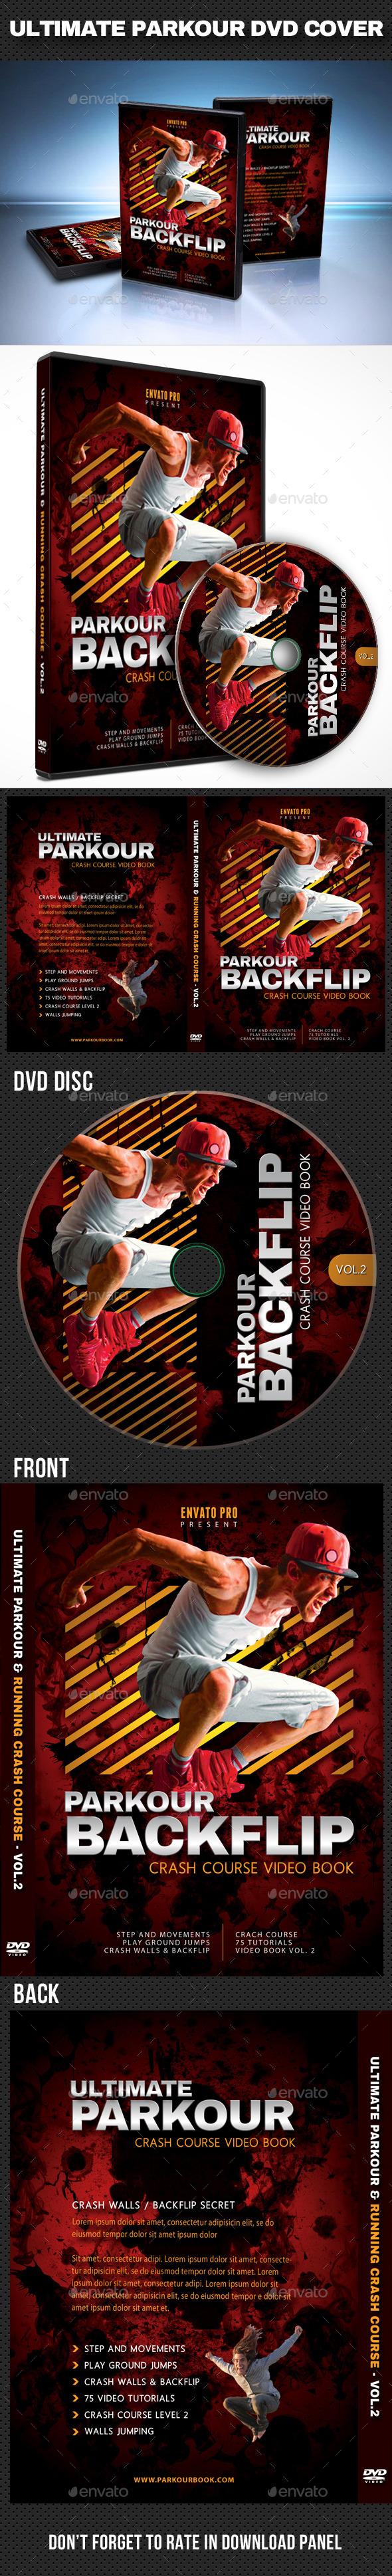 Ultimate Parkour DVD Cover Template V2 - CD & DVD Artwork Print Templates